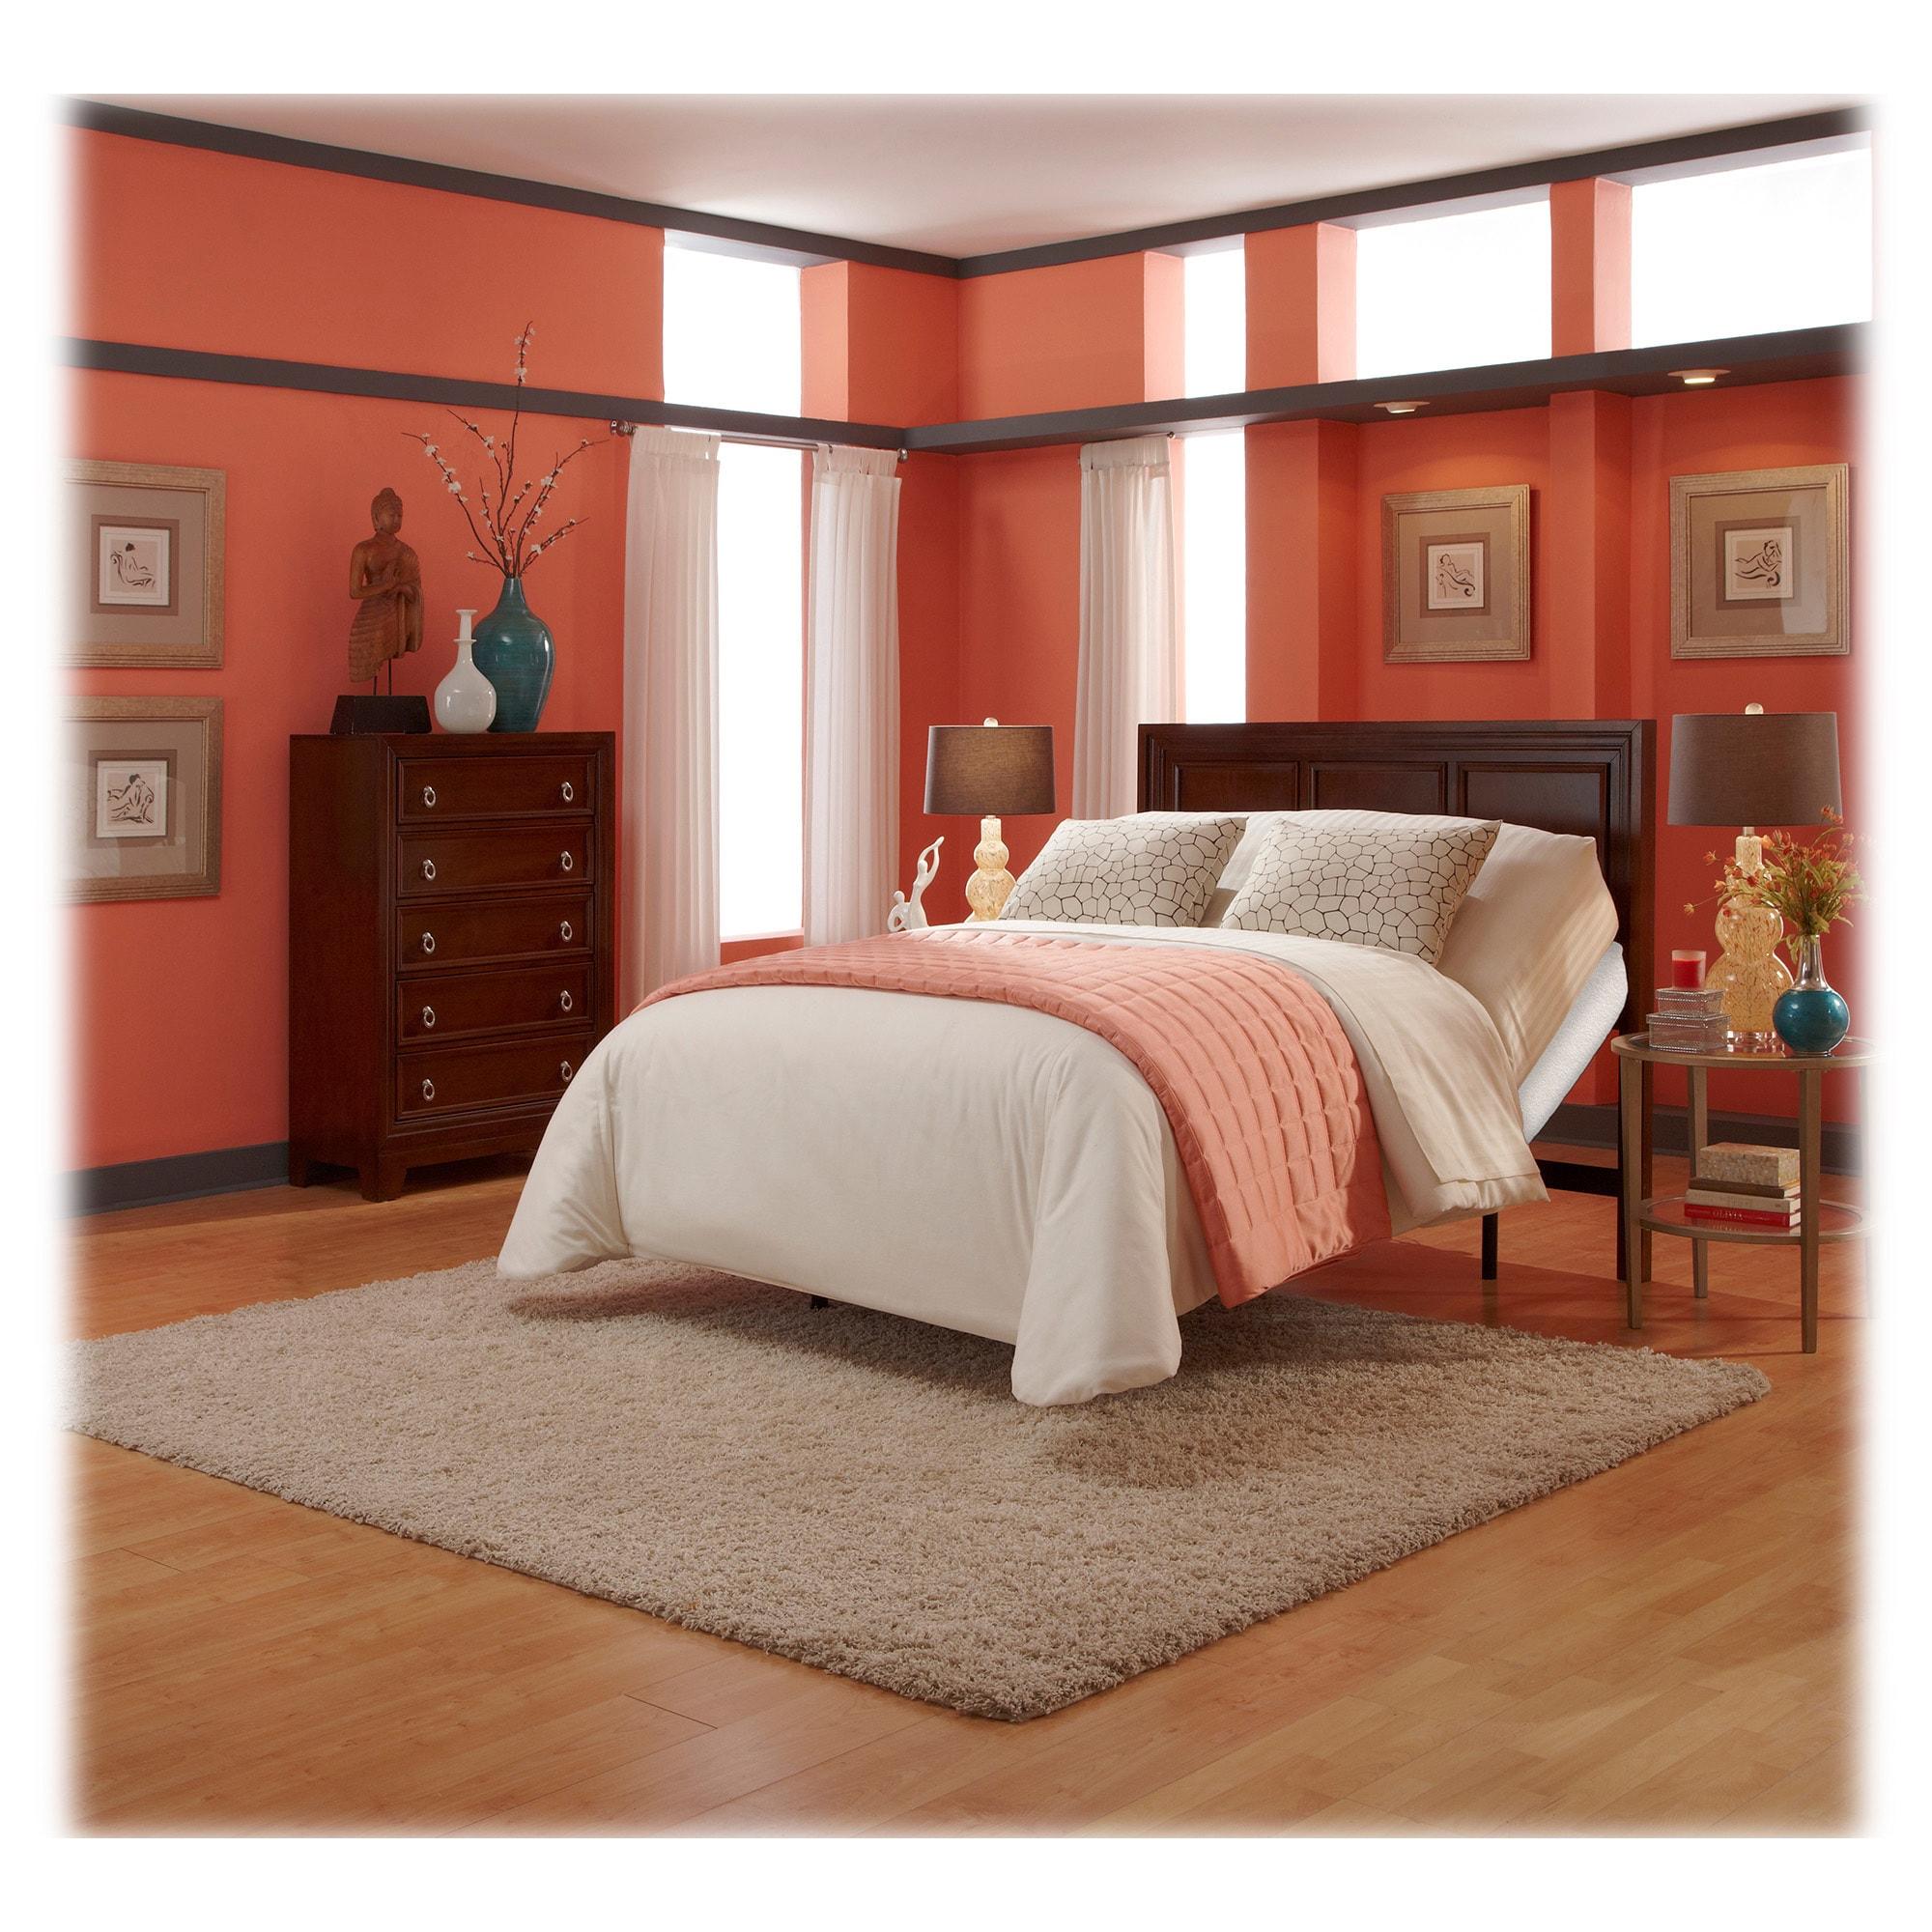 Fashion Bed Group Signature Adjustable Platform Base with...